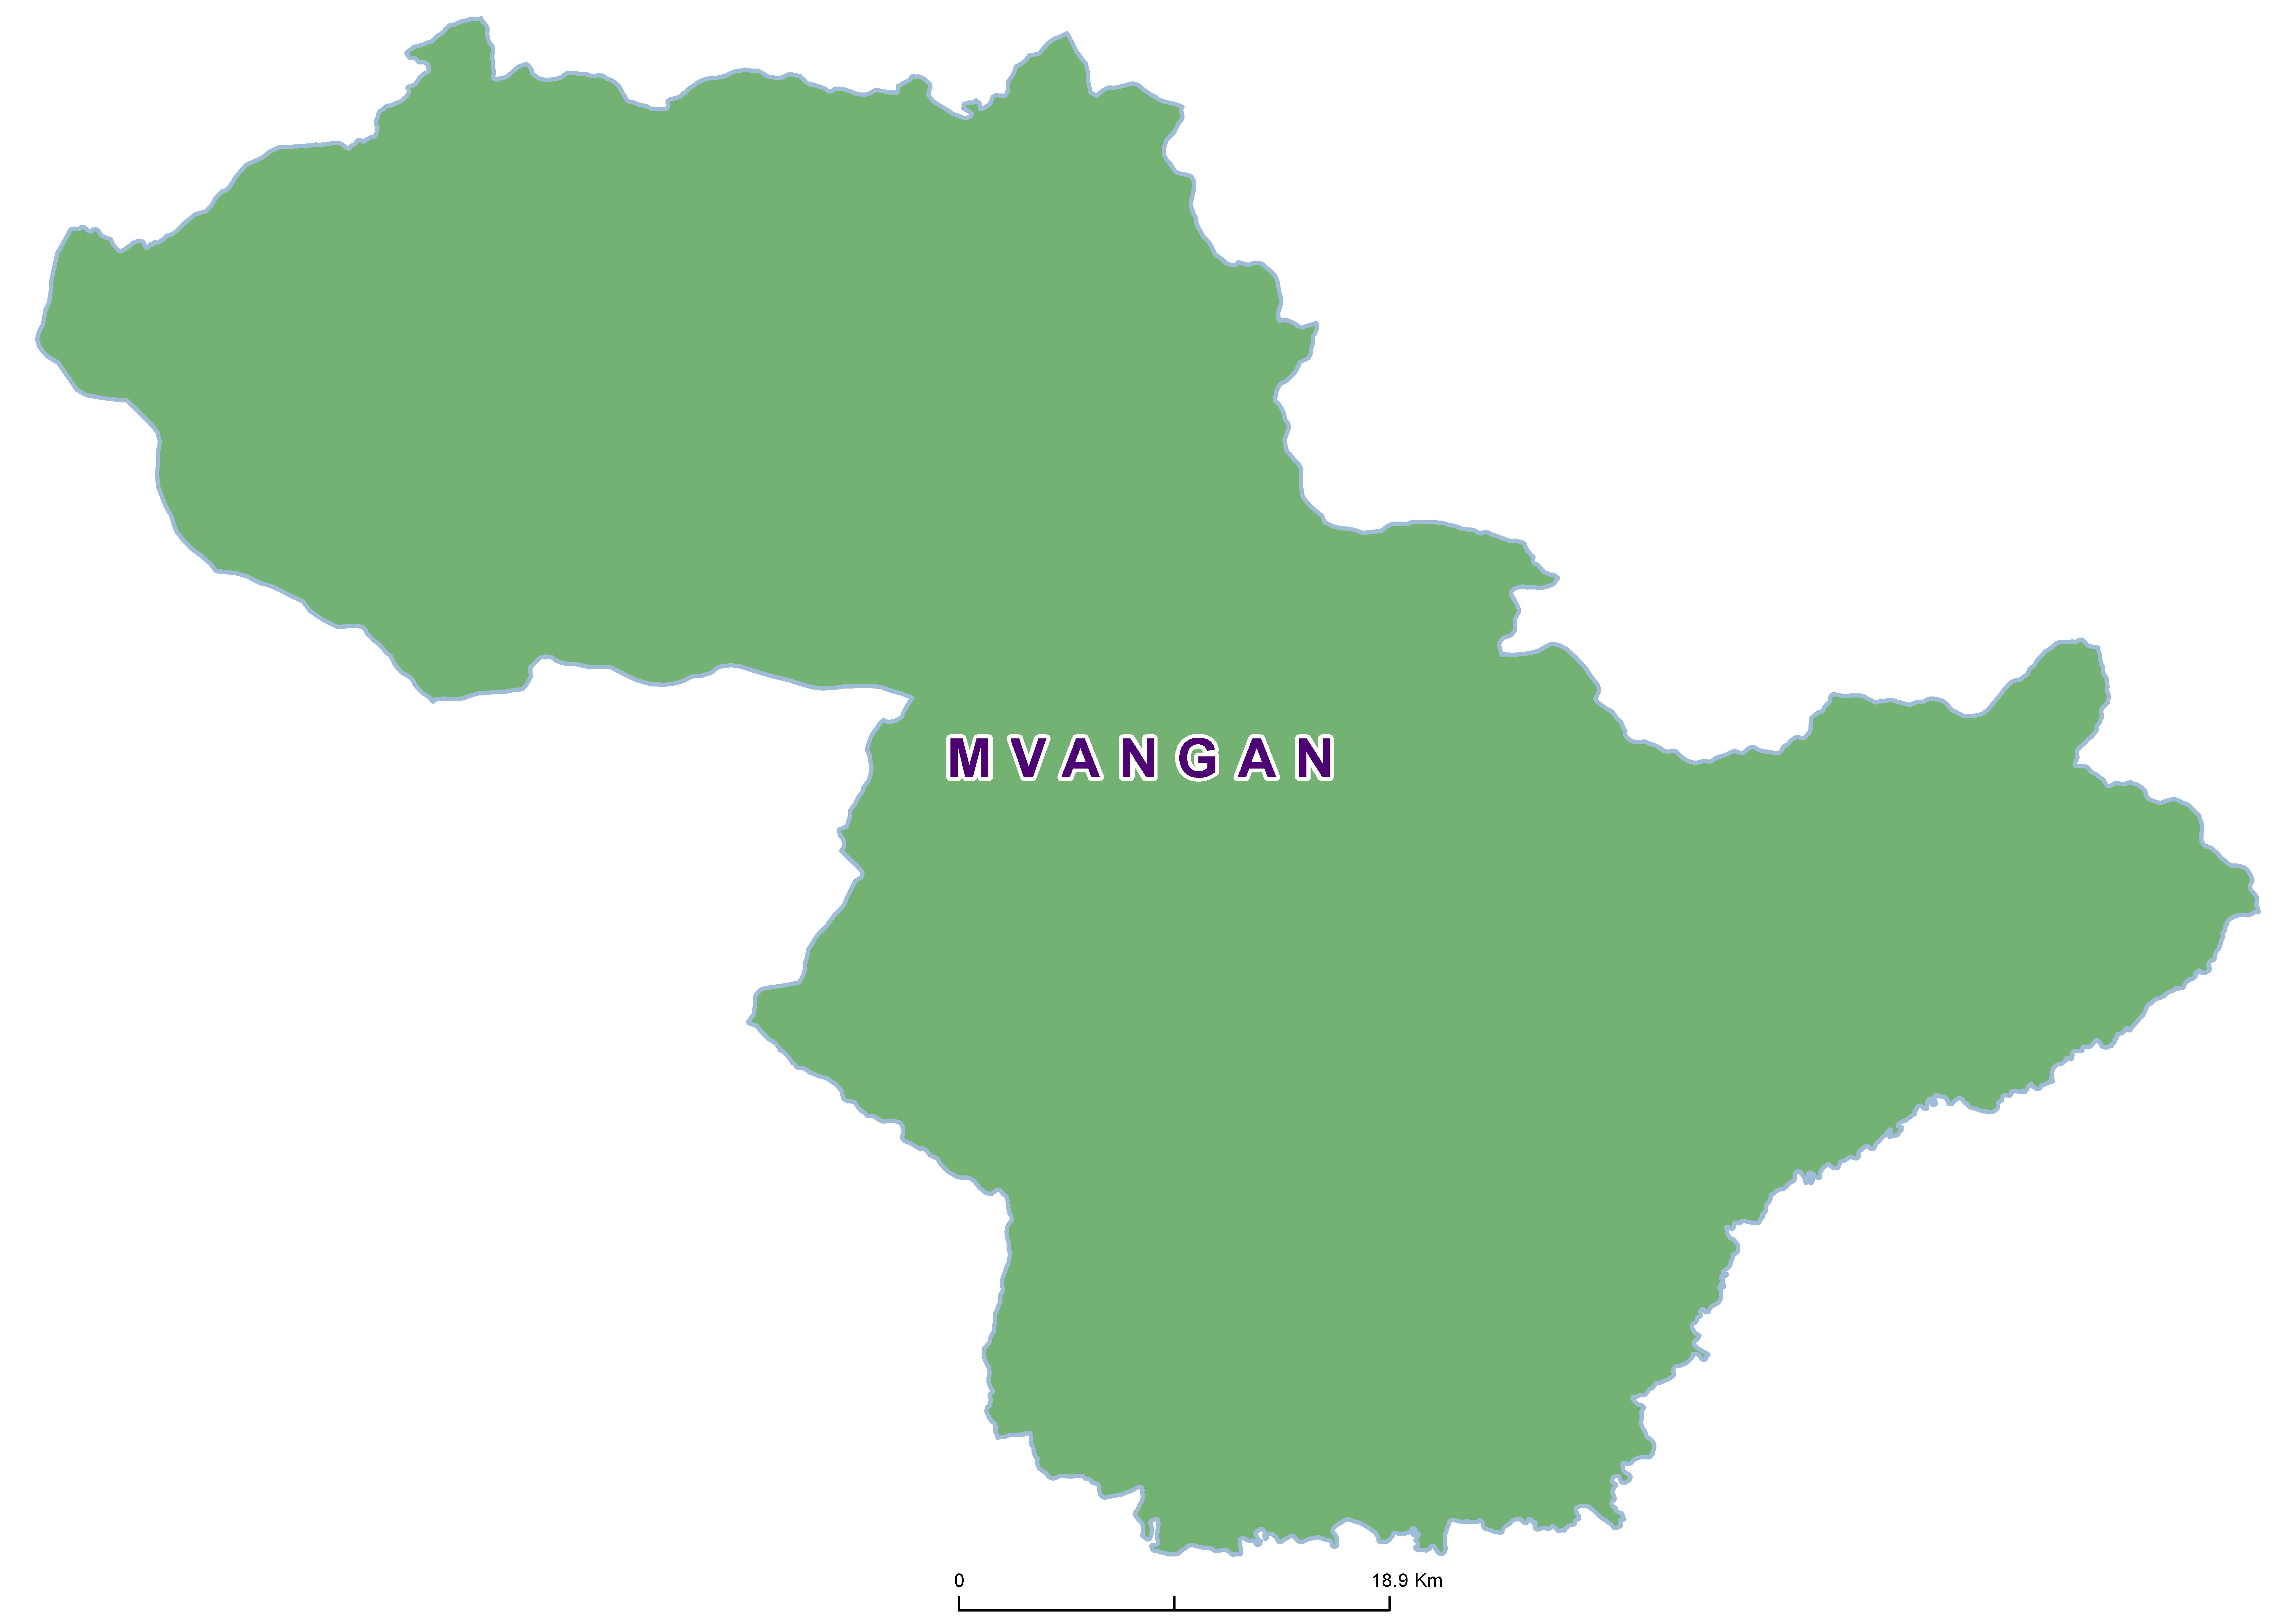 Mvangan Mean SCH 19850001